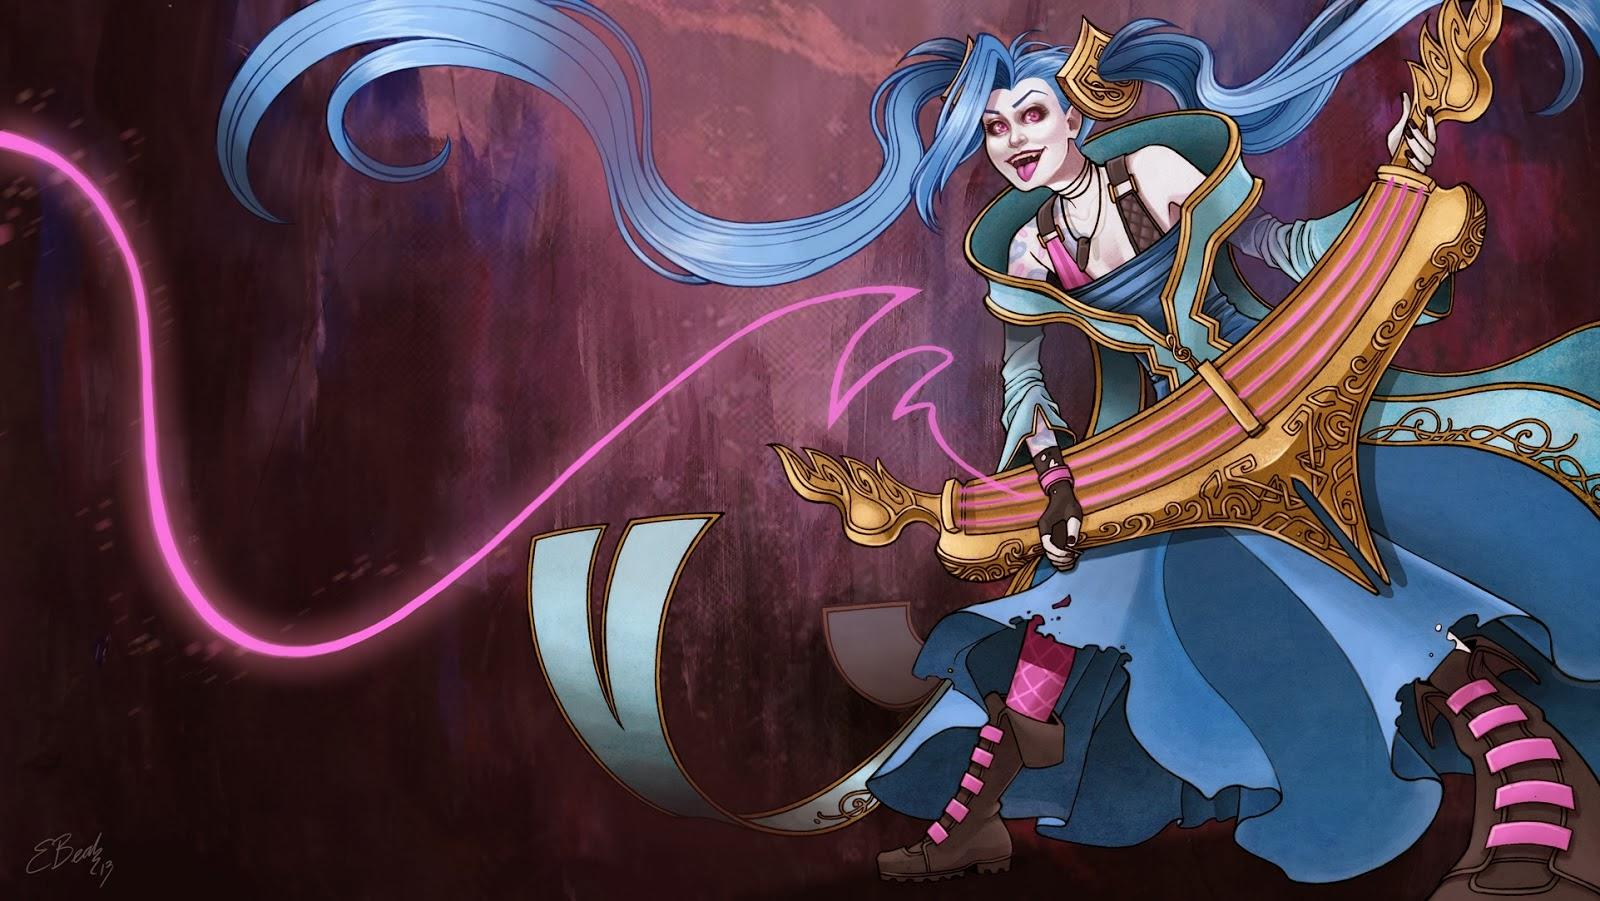 Jinx League Of Legends Wallpaper, Jinx Desktop Wallpaper-9720